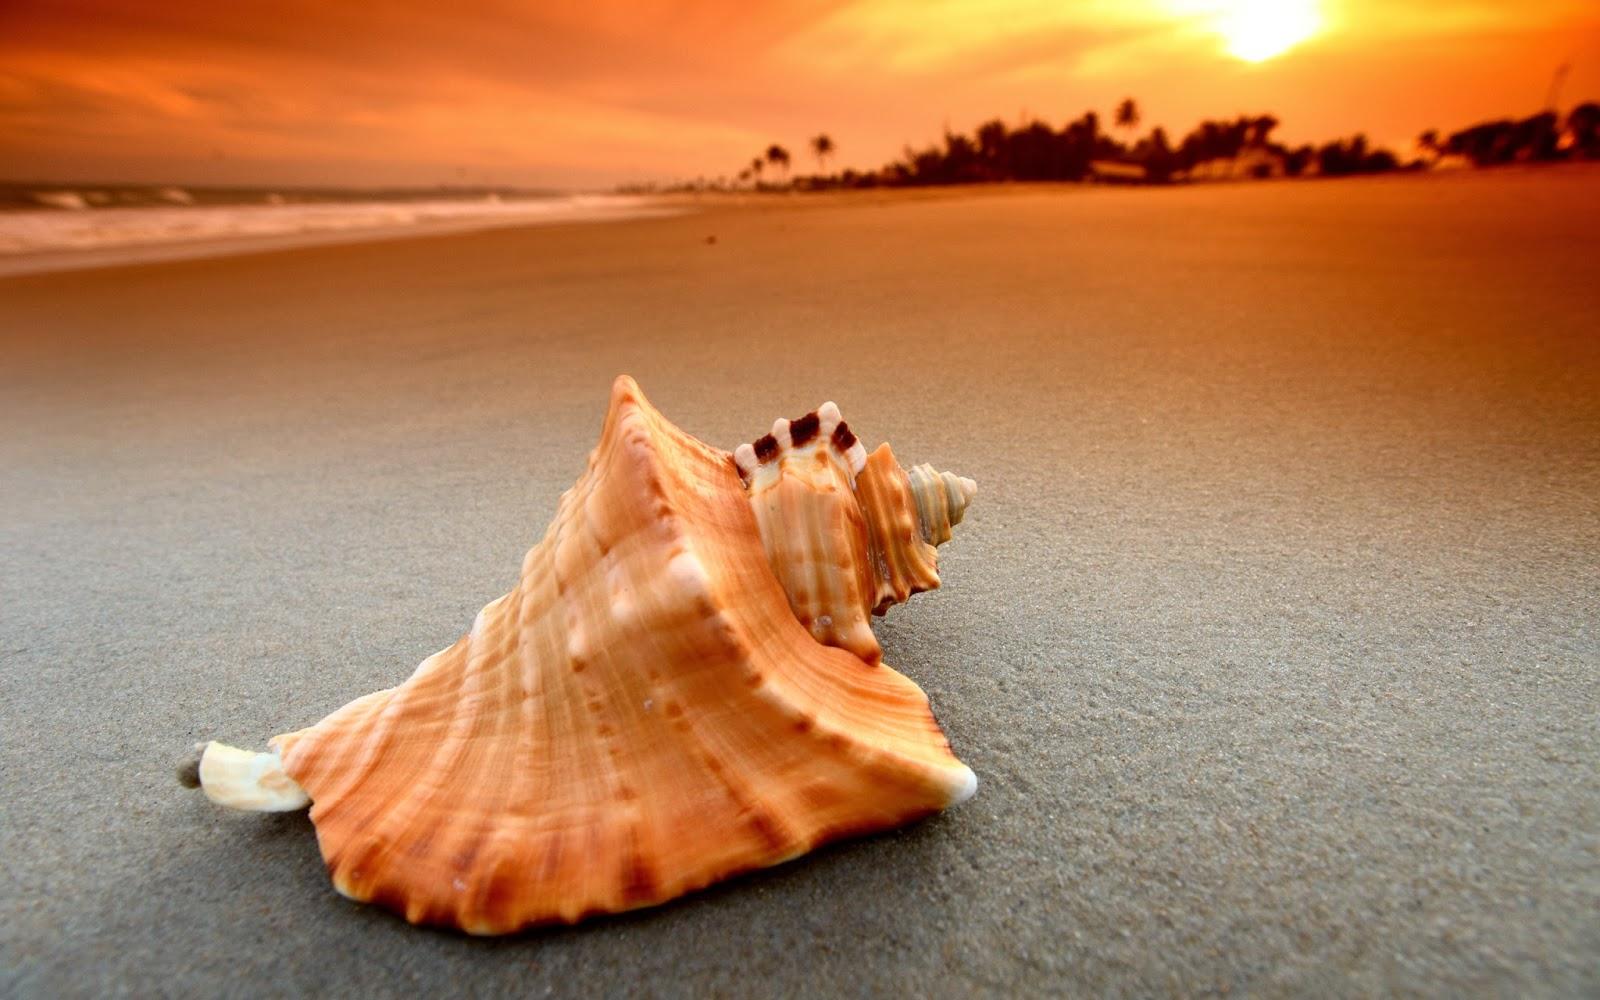 shells in the sunset wallpaper wallpaper wide hd